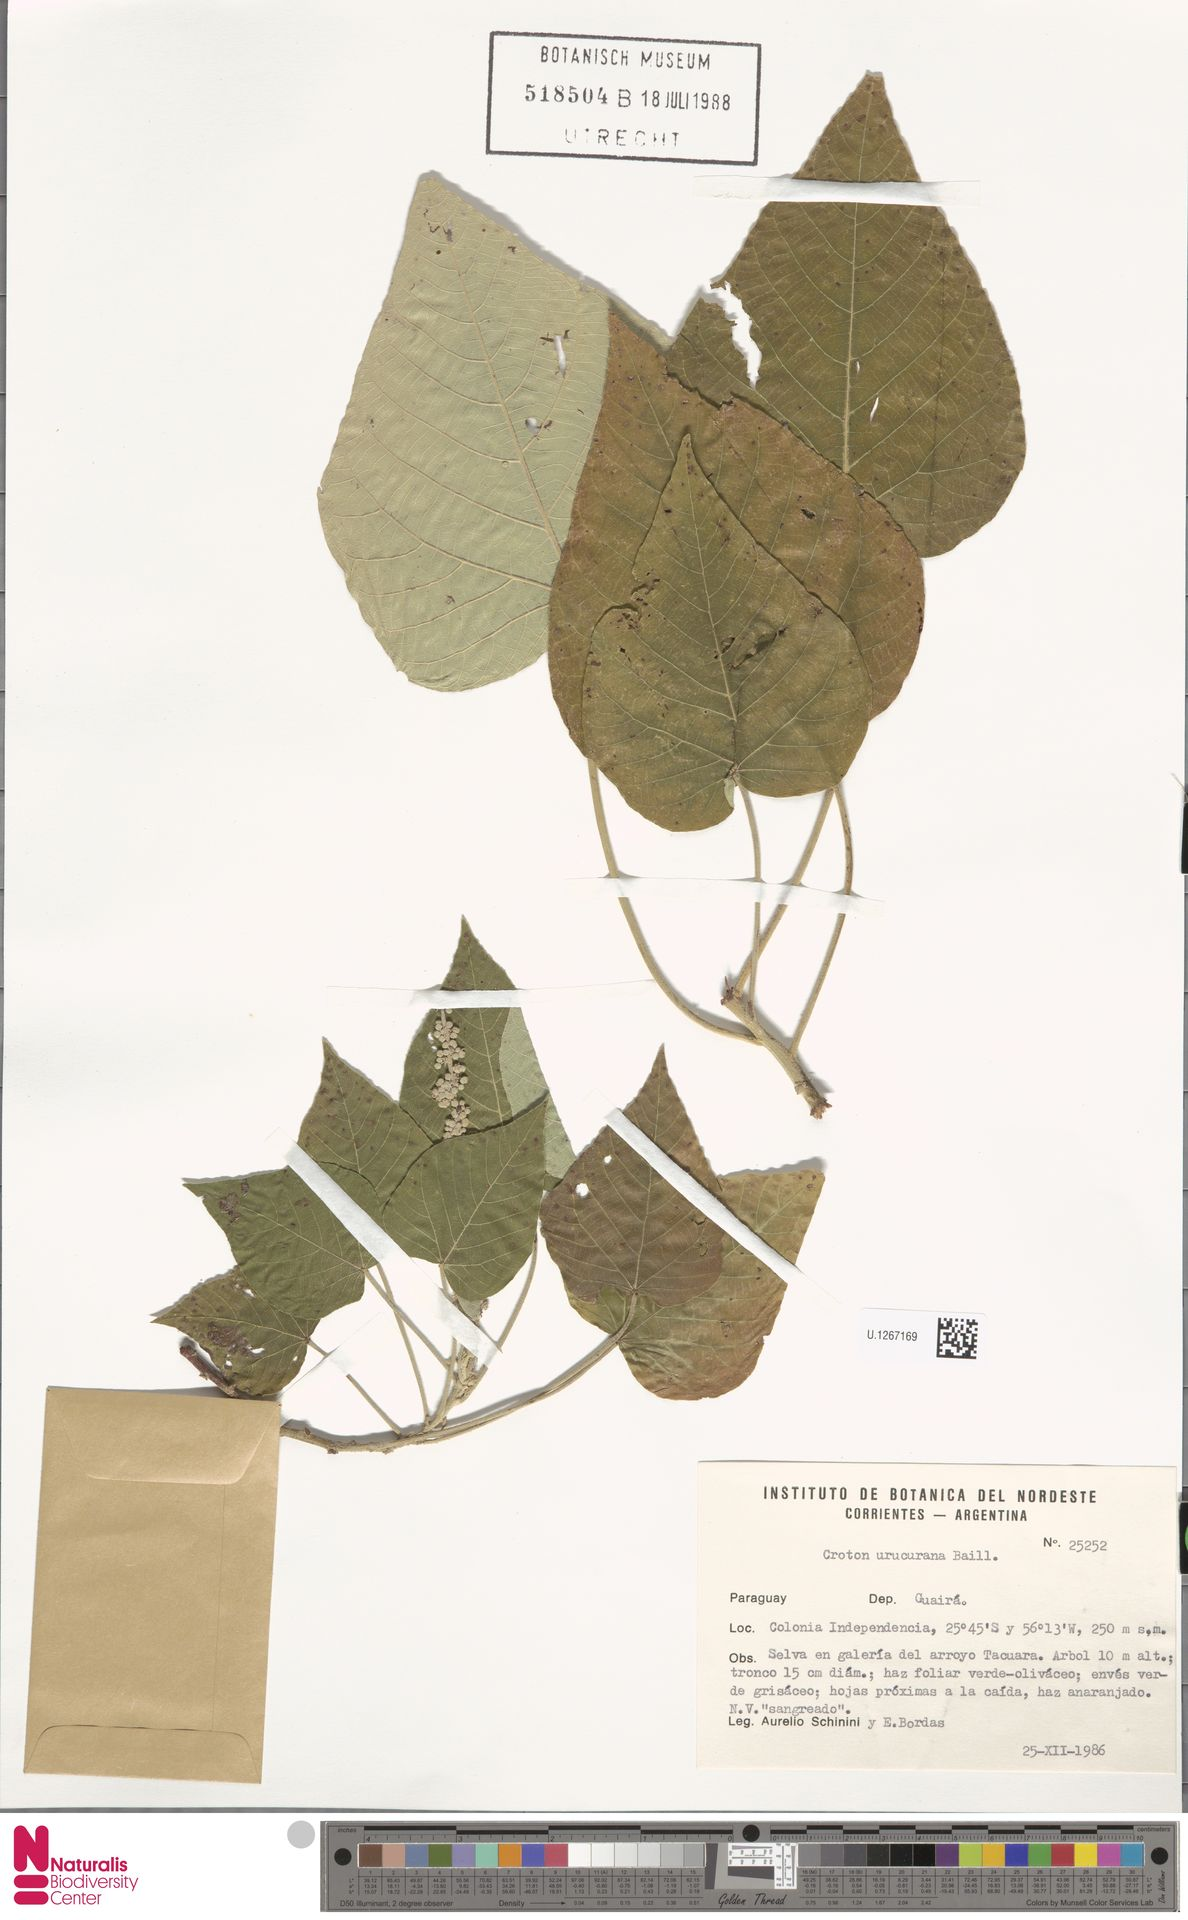 U.1267169 | Croton urucurana Baill.